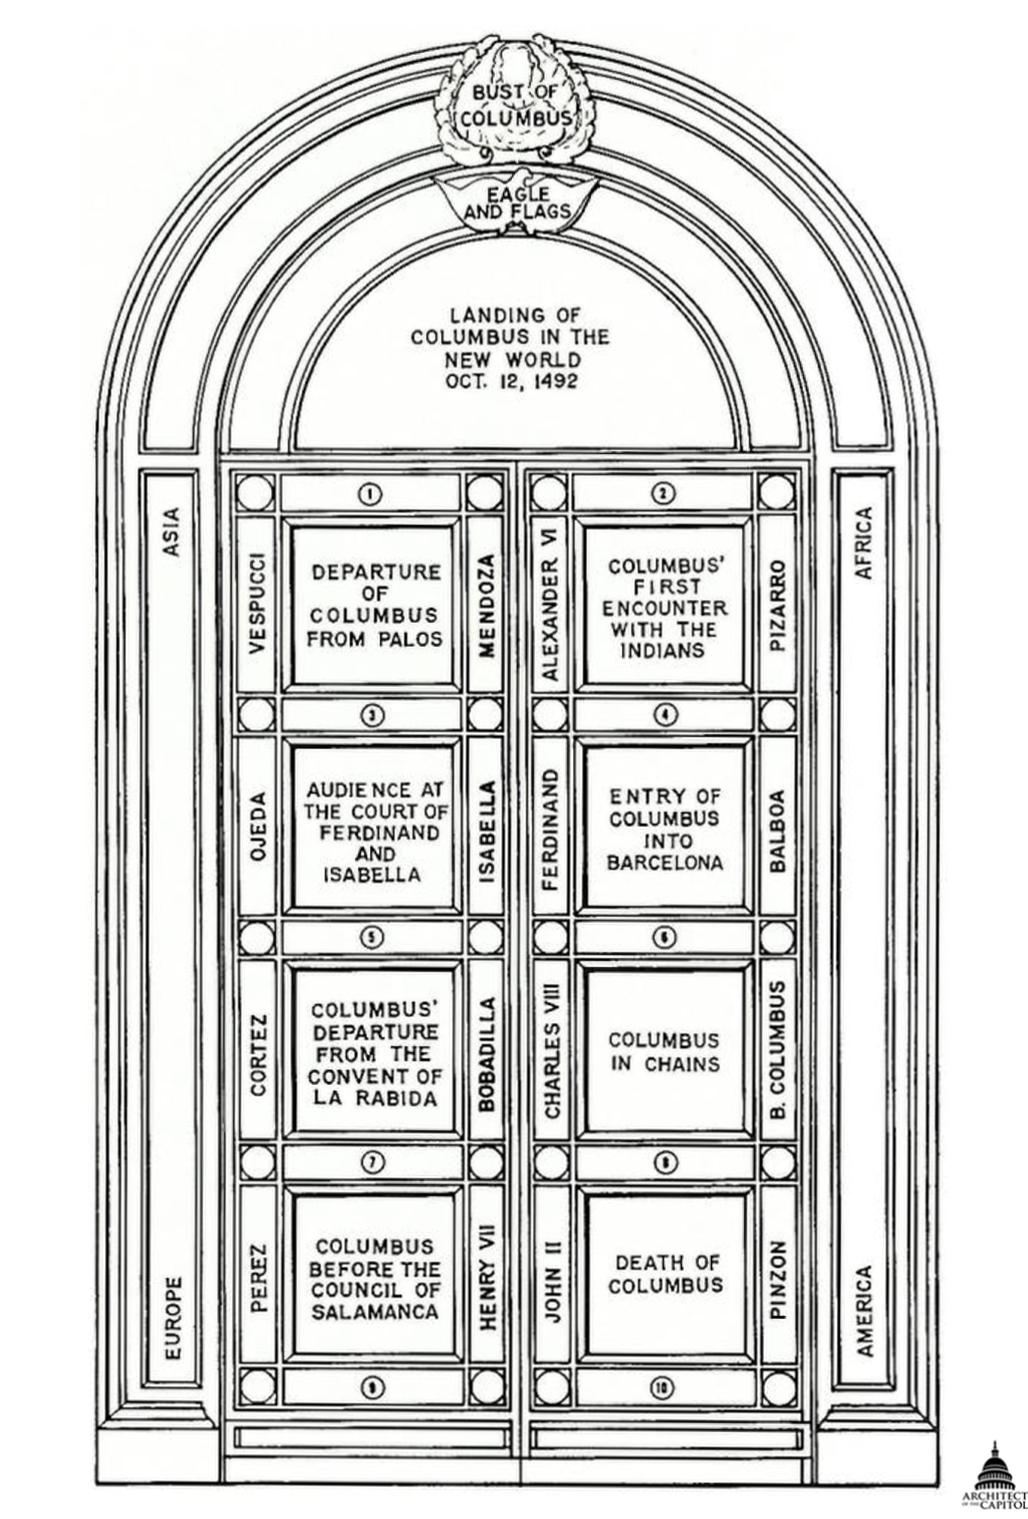 FileUSA Capitol - Columbus Doors Drawing AOC.png  sc 1 st  Wikimedia Commons & File:USA Capitol - Columbus Doors Drawing AOC.png - Wikimedia Commons pezcame.com